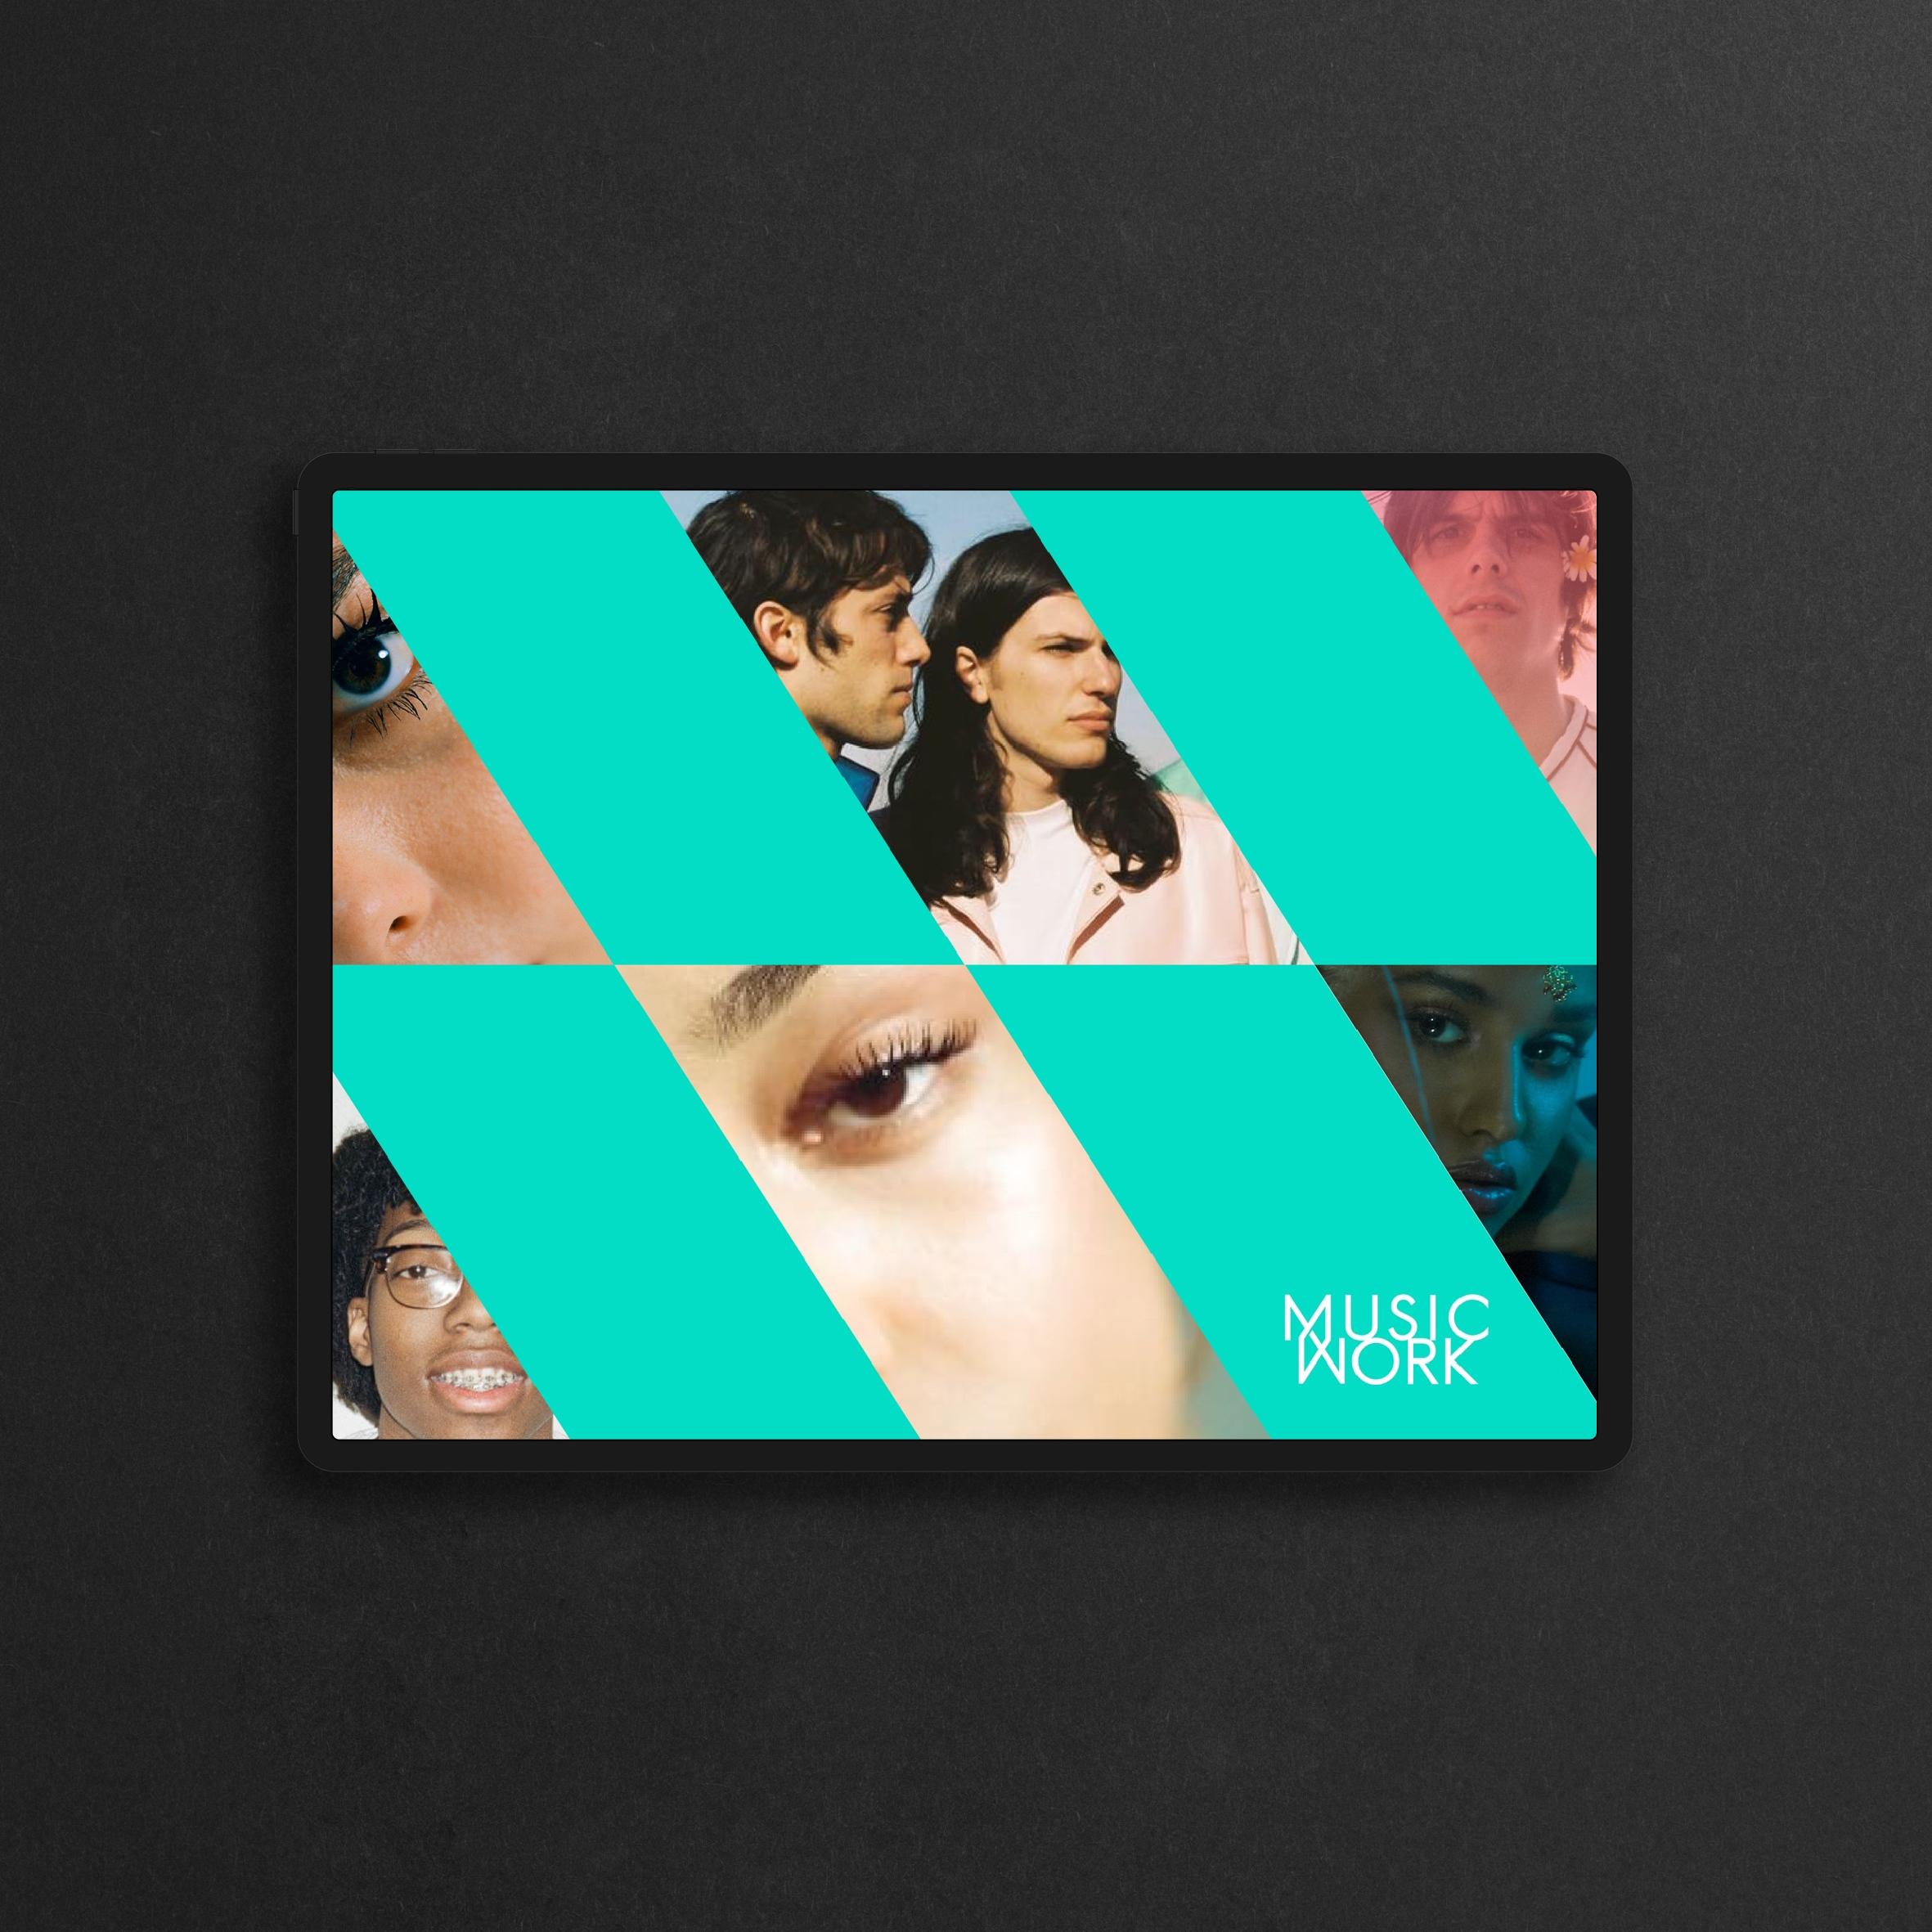 ux ui app music work page 9